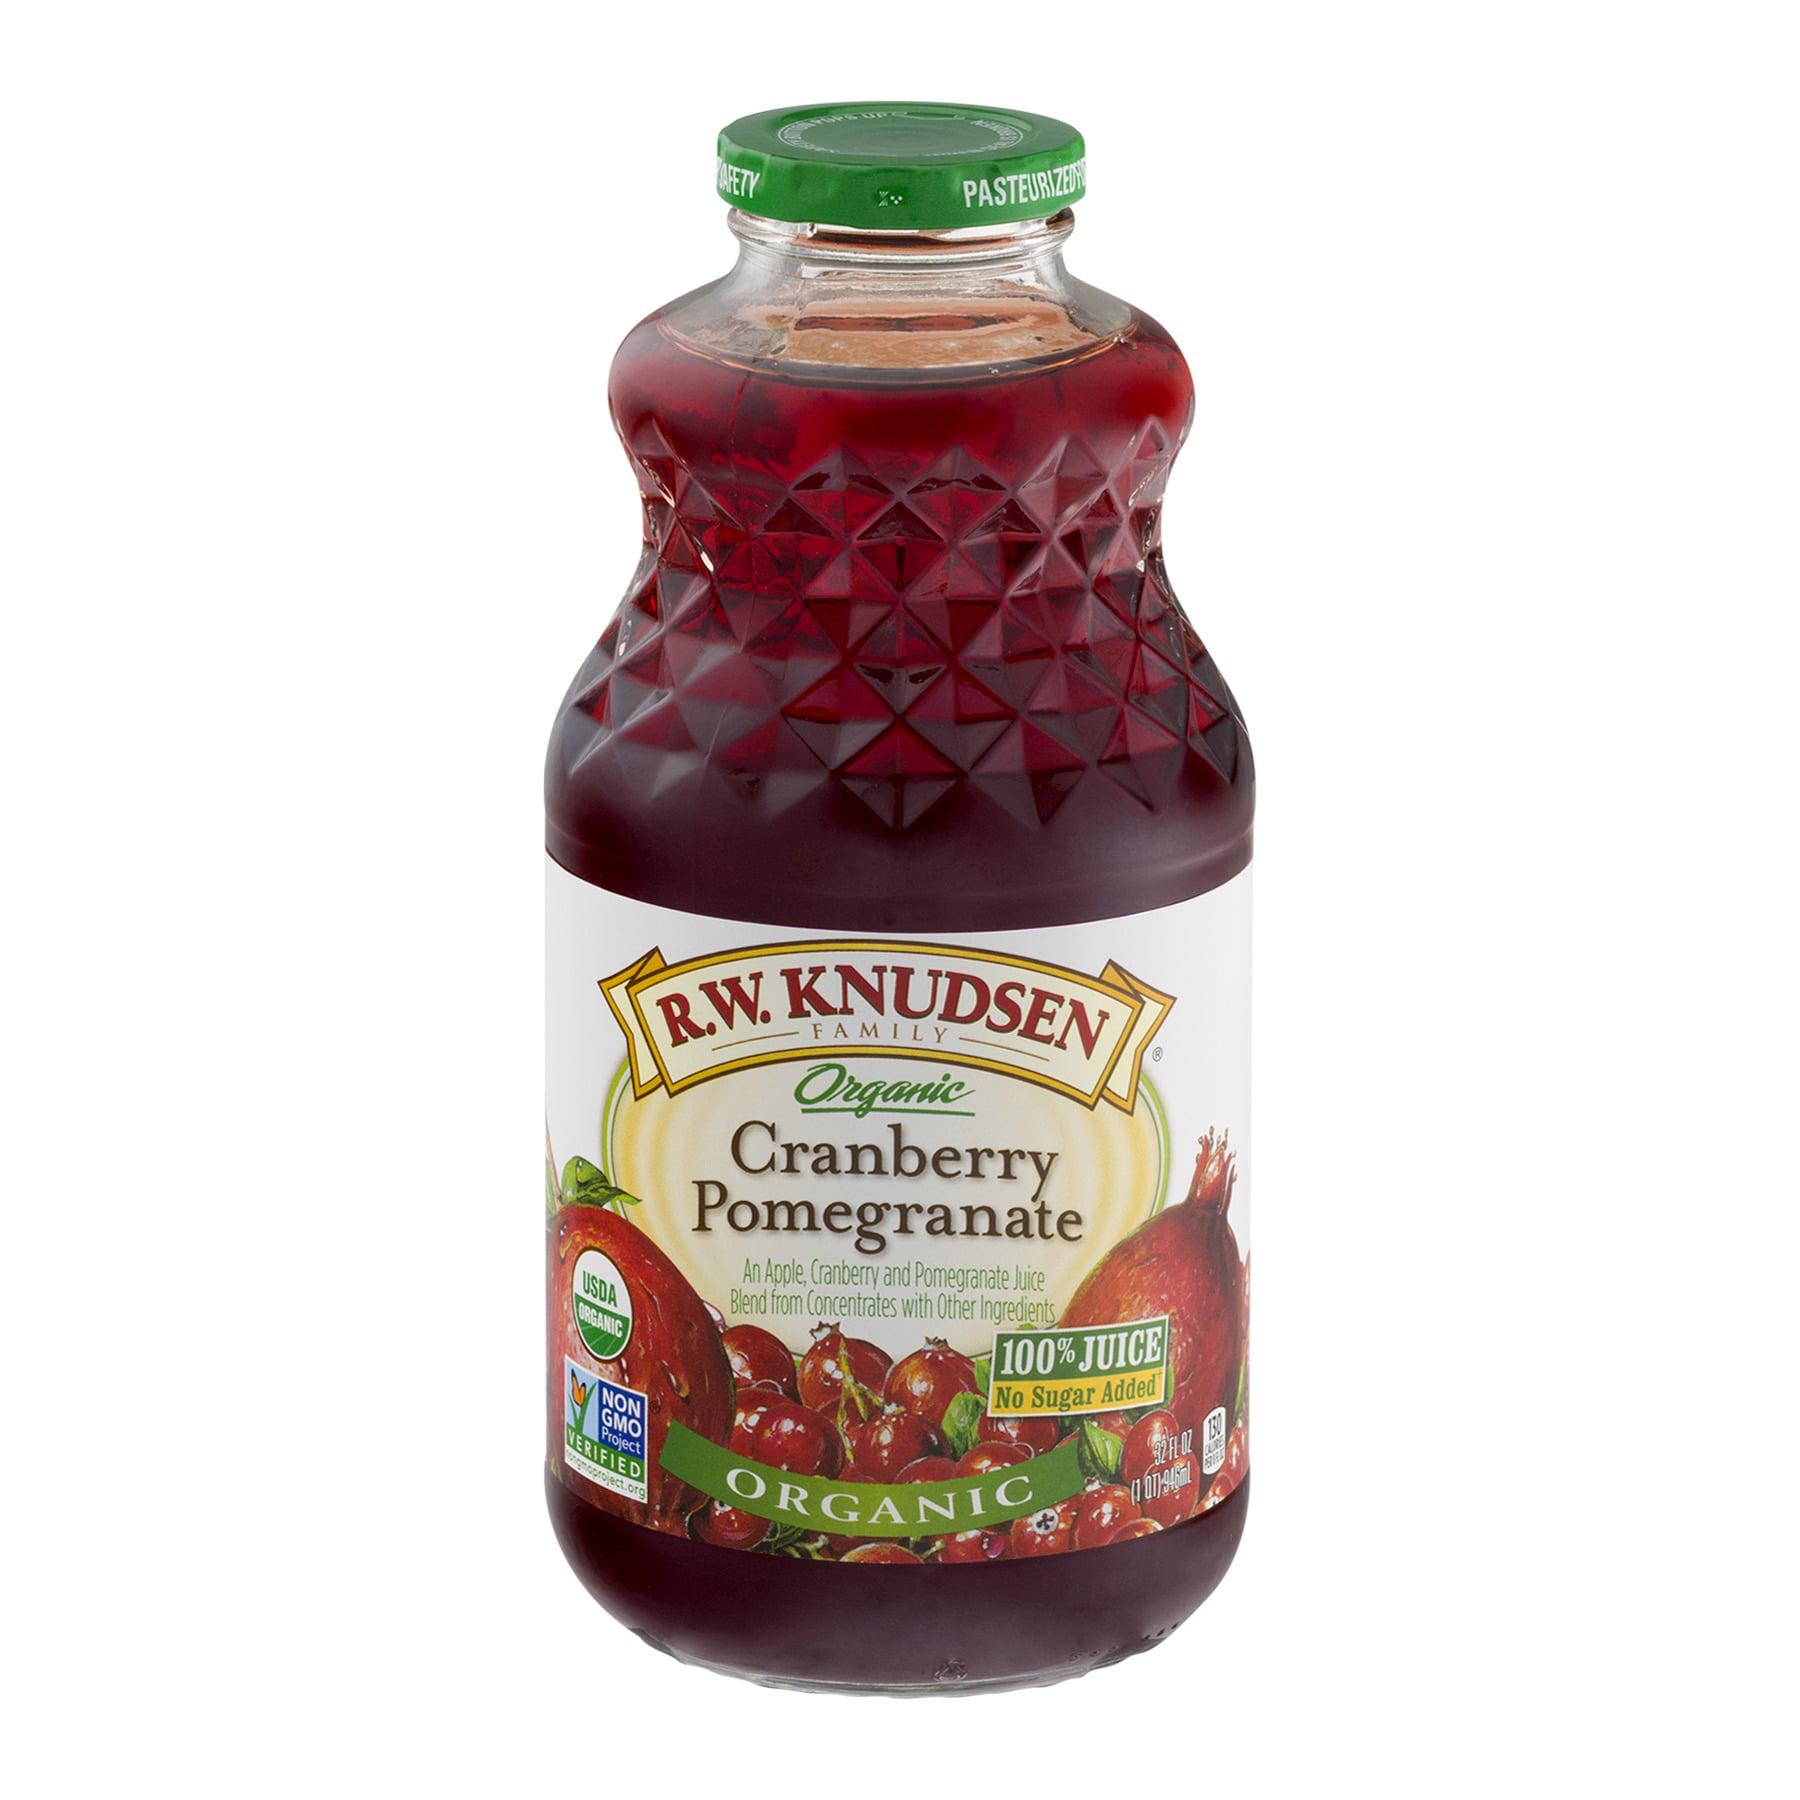 R.W. Knudsen Family Organic Juice, Cranberry Pomegranate, 32 Fl Oz, 1 Count